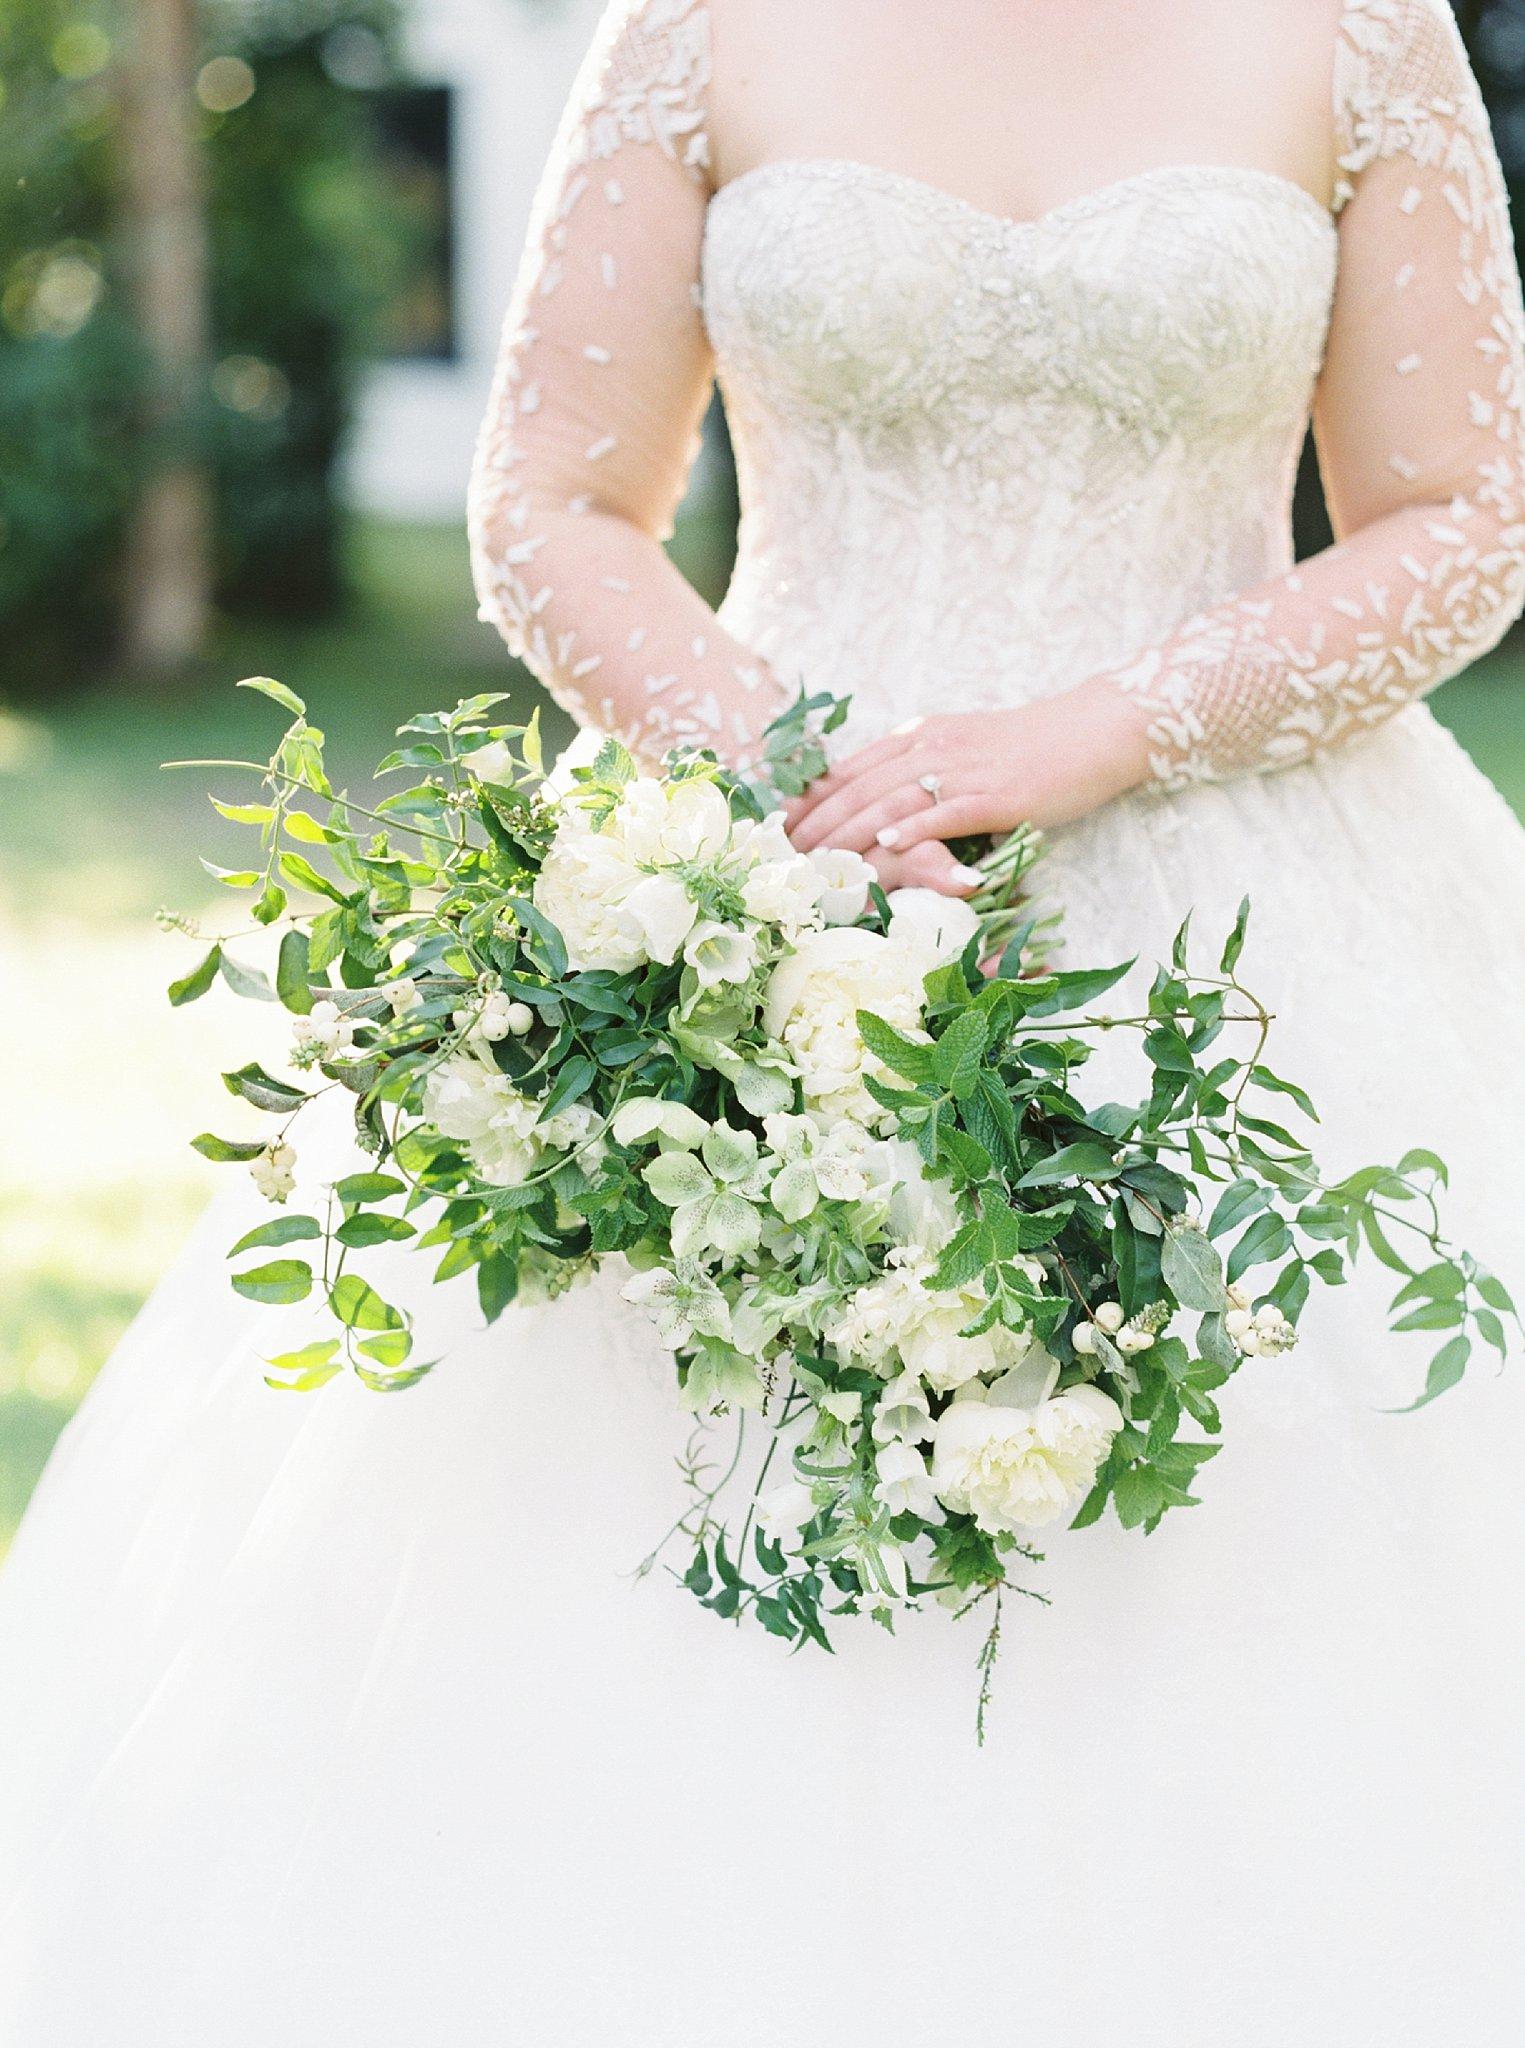 xan Charleston wedding photographer11.jpg